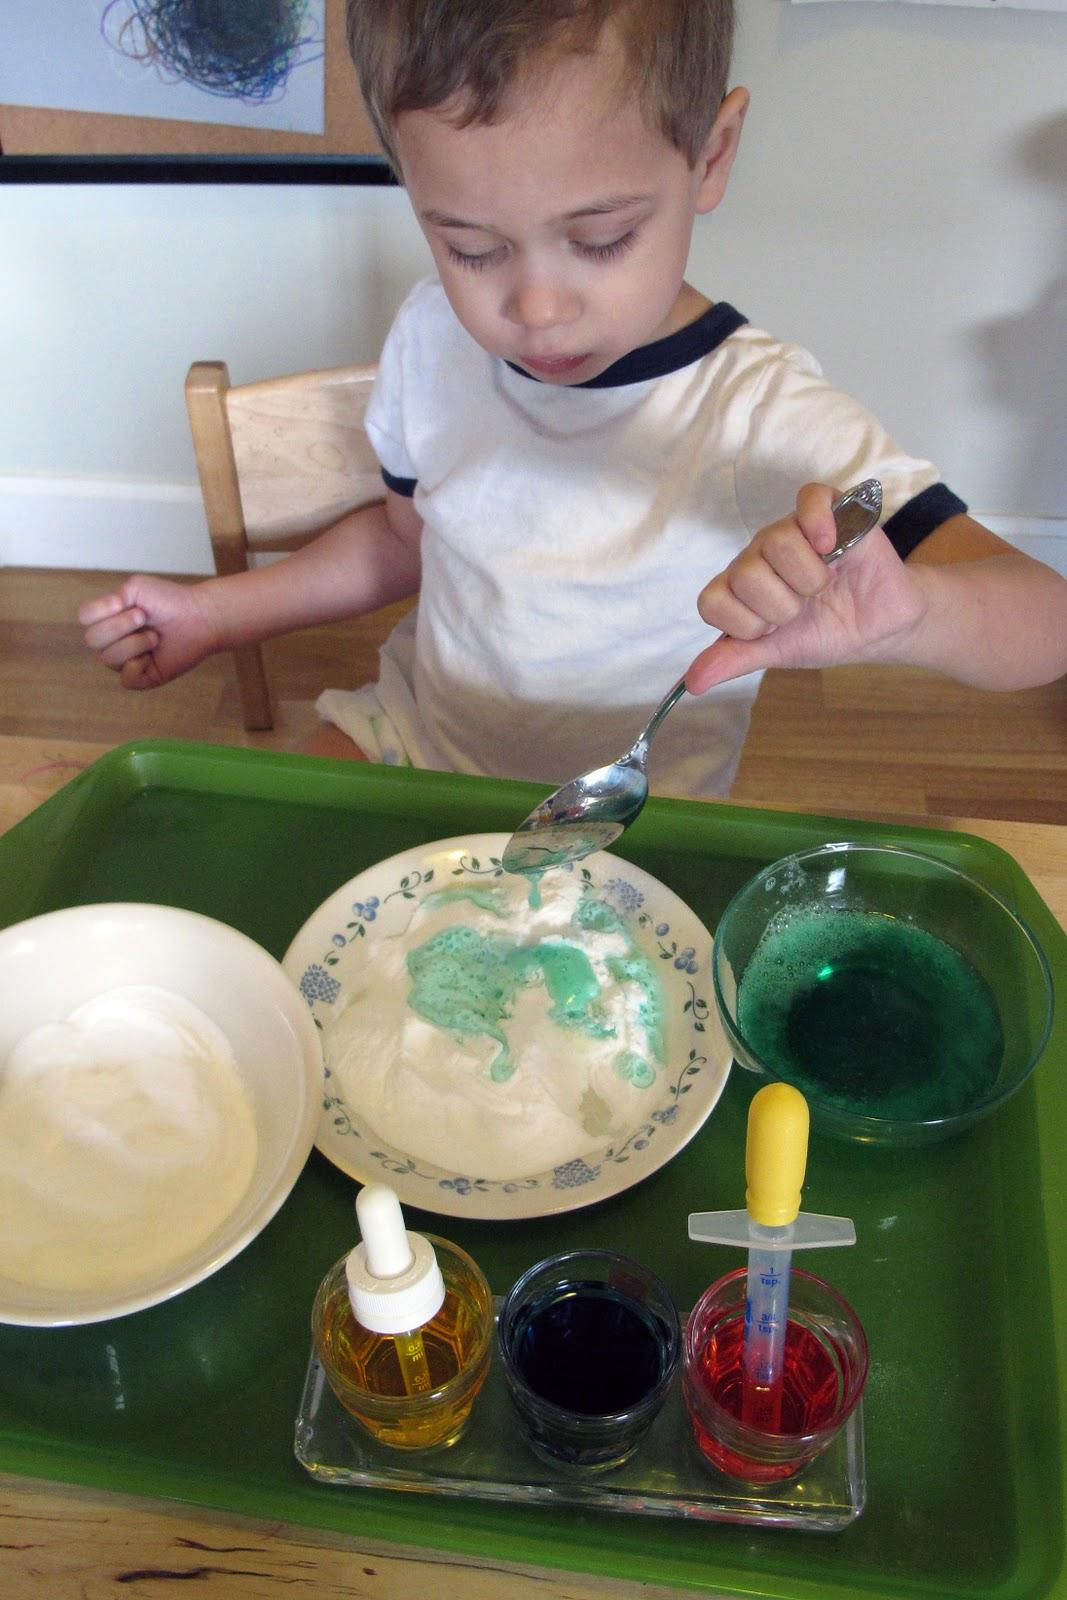 MAKE ART WITH BAKING SODA - Kids Activities